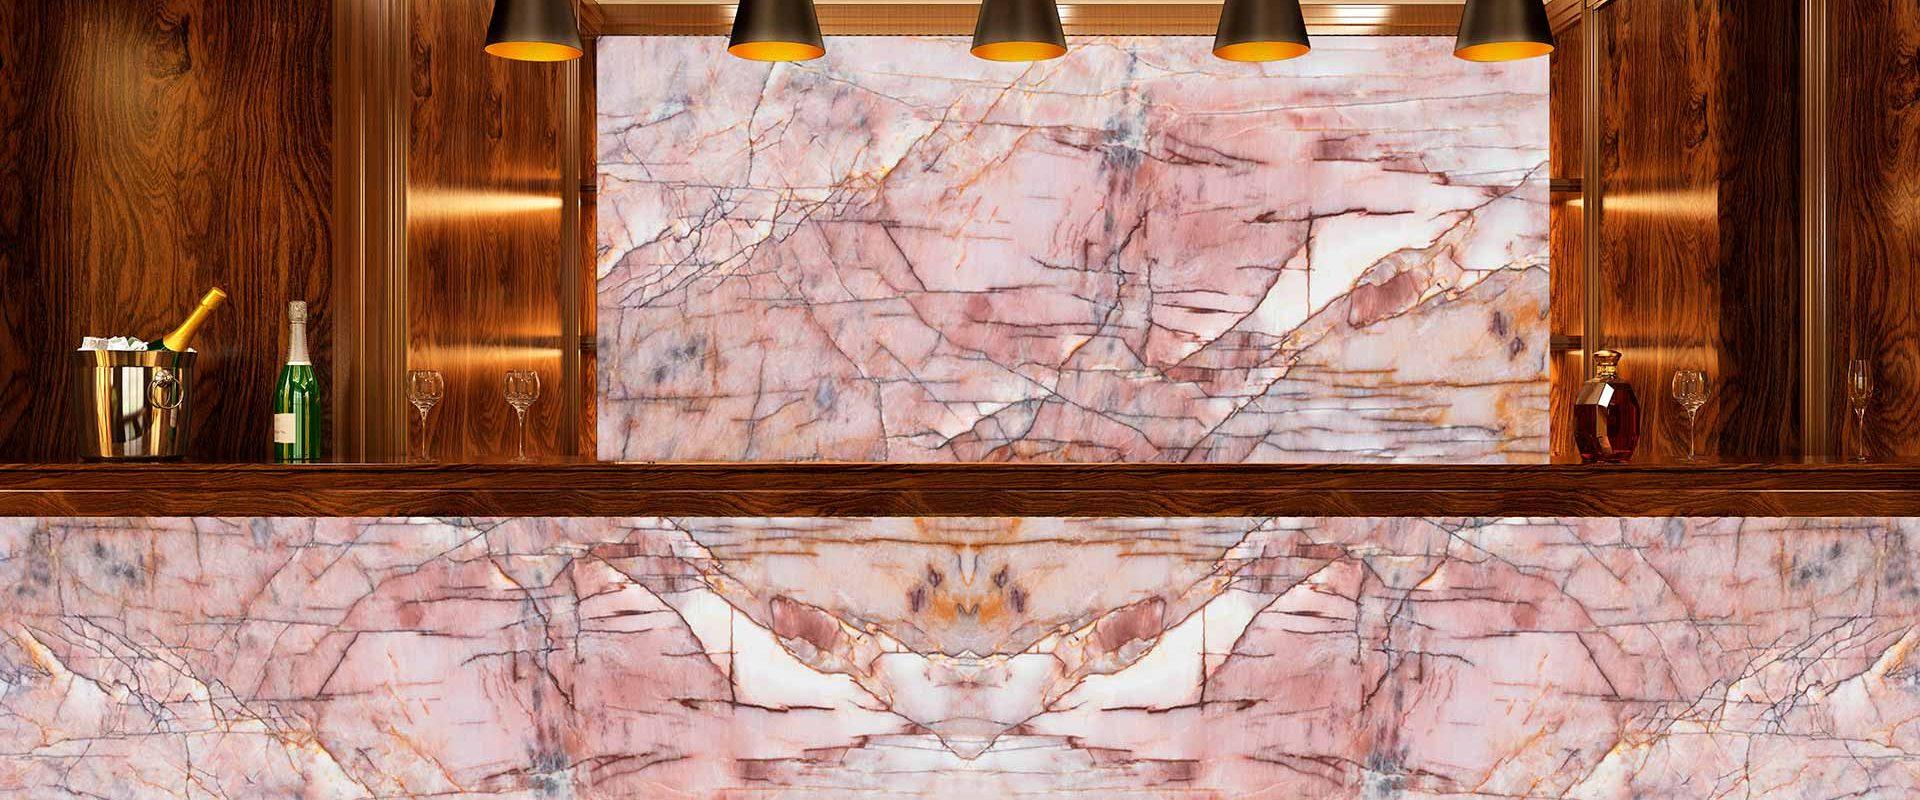 Bar-transl-luxury---Cristallo-Cosmolitan